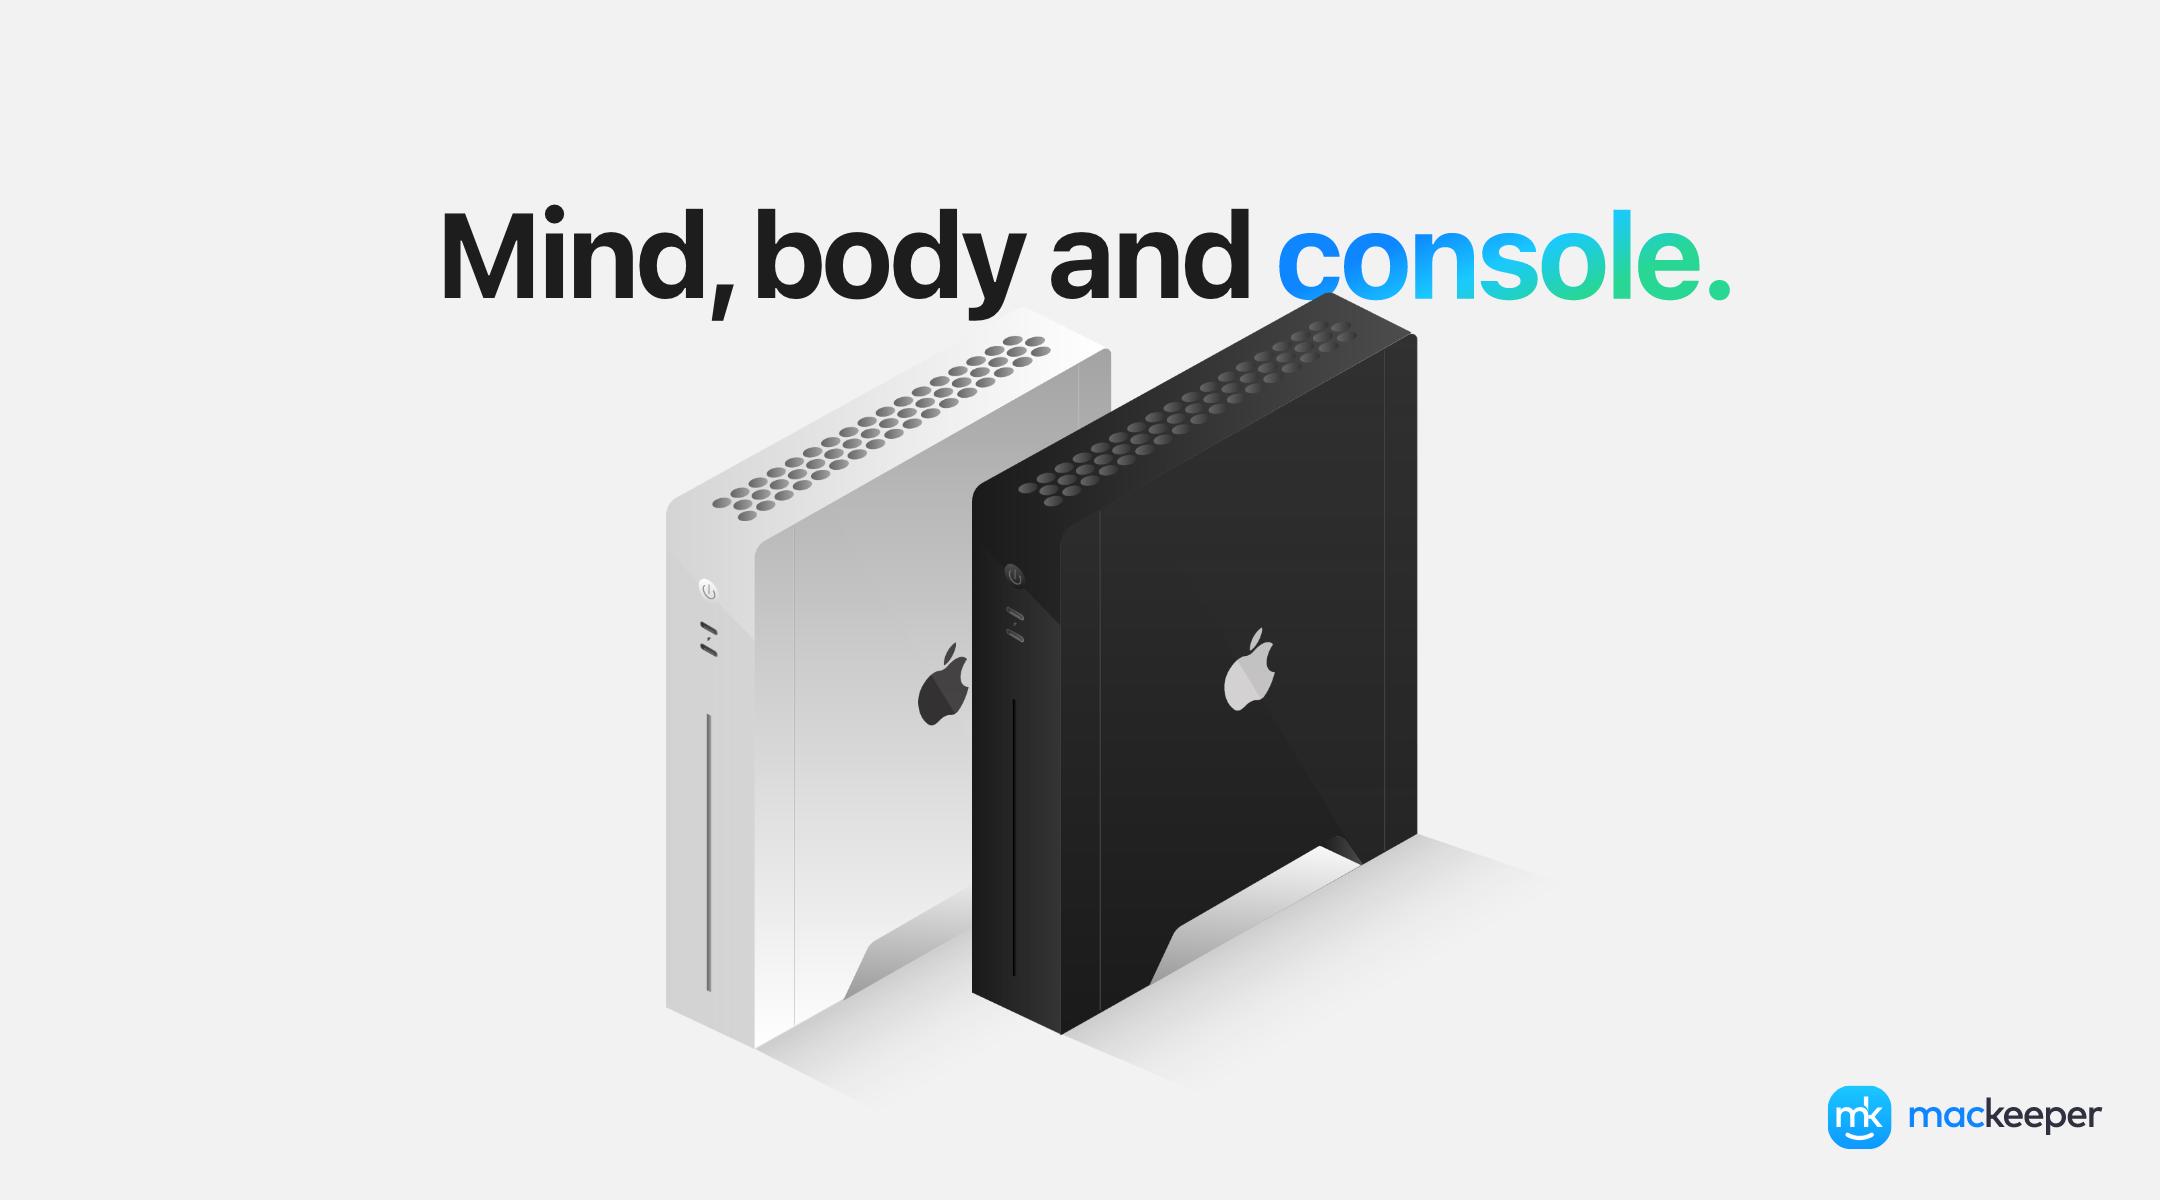 amy-jones-mackeeper-apple-collection-concept-ads-1@2x